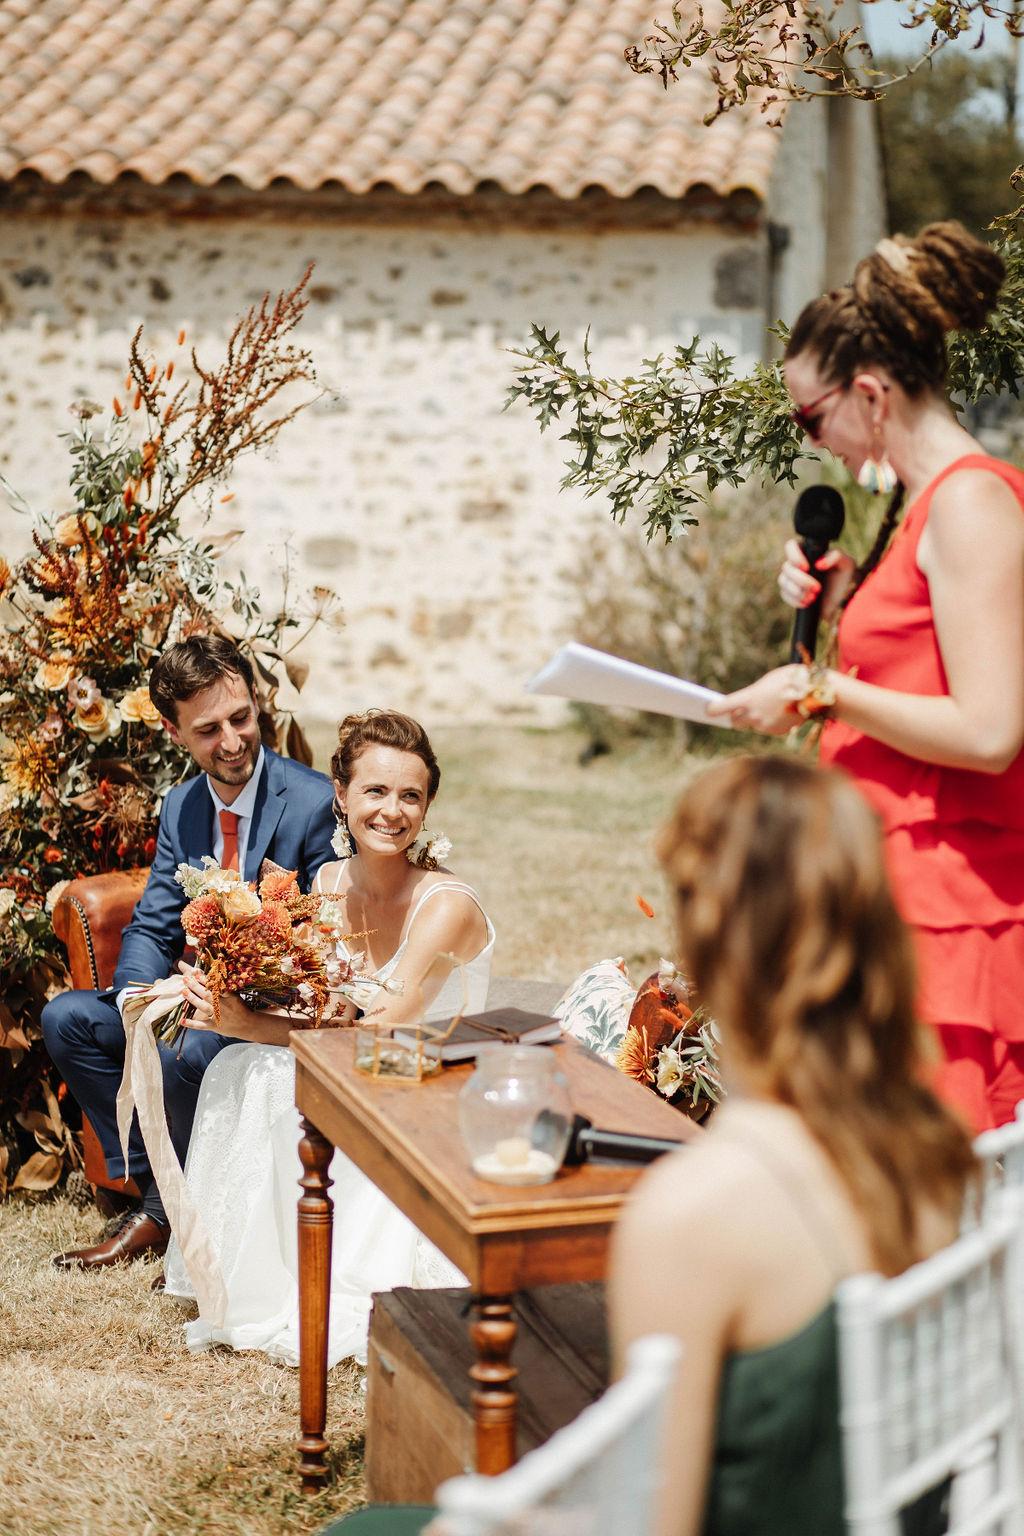 Mariage boheme Terra Cotta pays de la loire vendee nantes